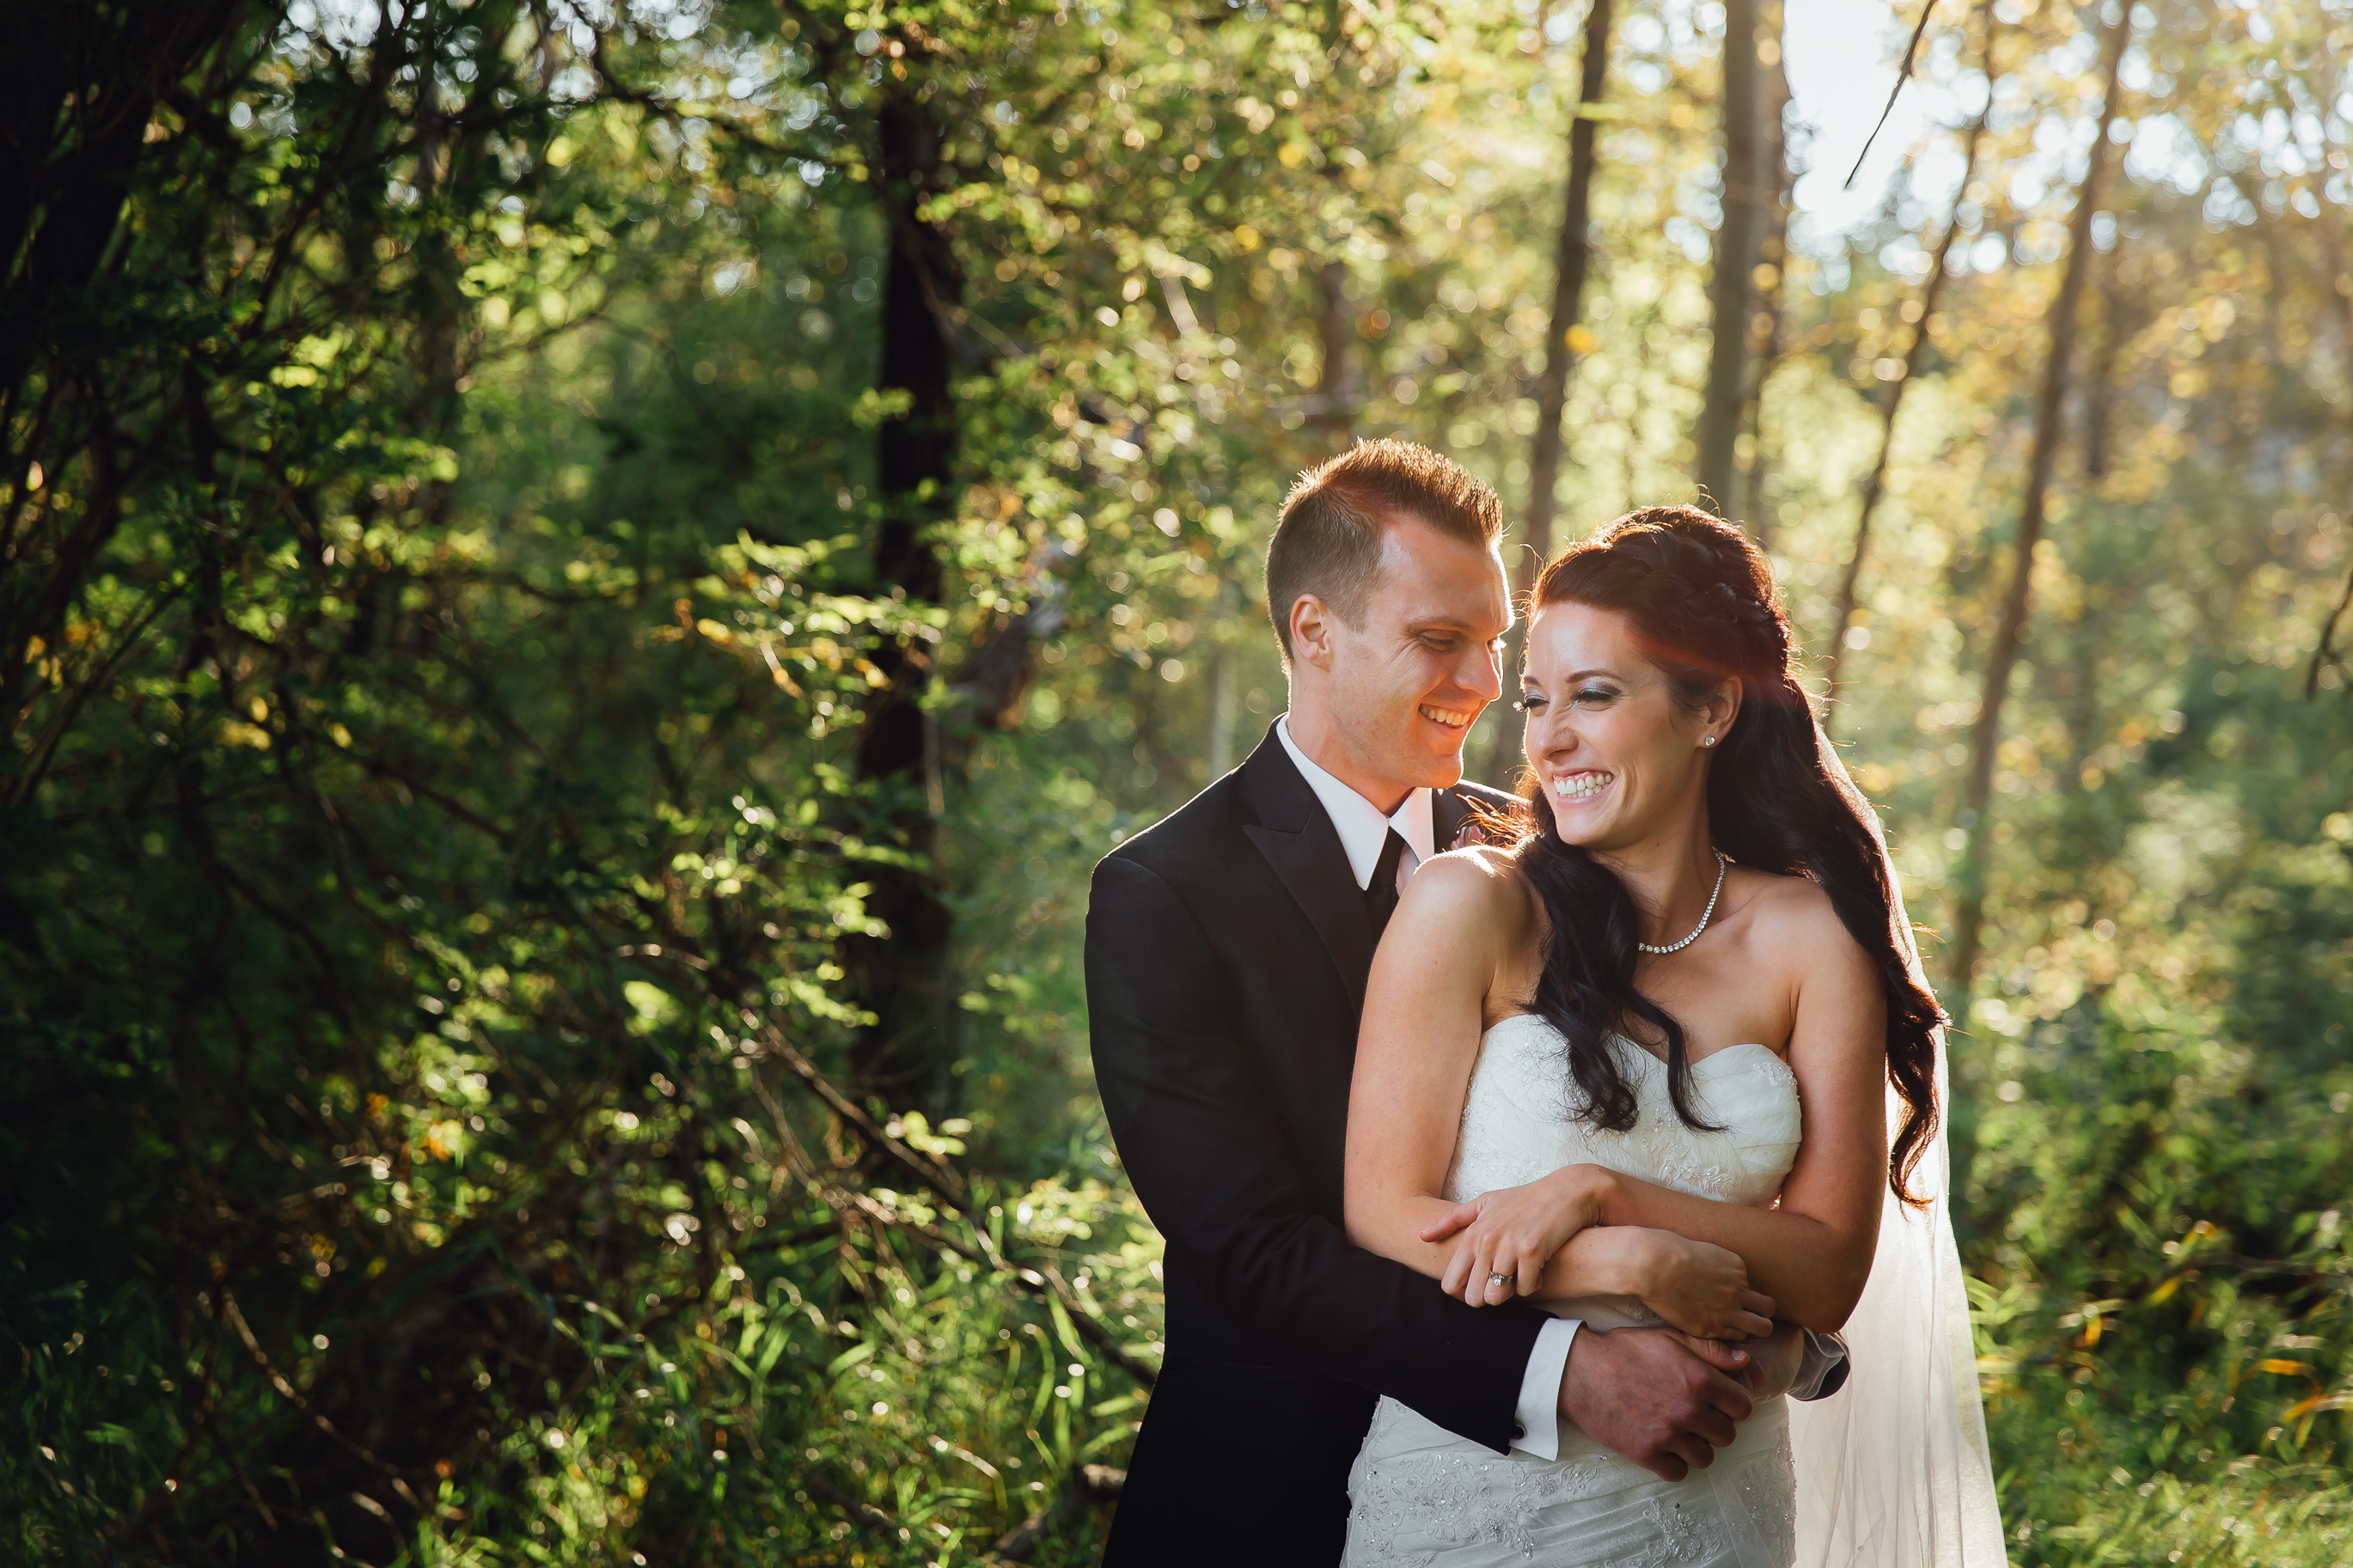 Edmonton Wedding Photographers - River Valley